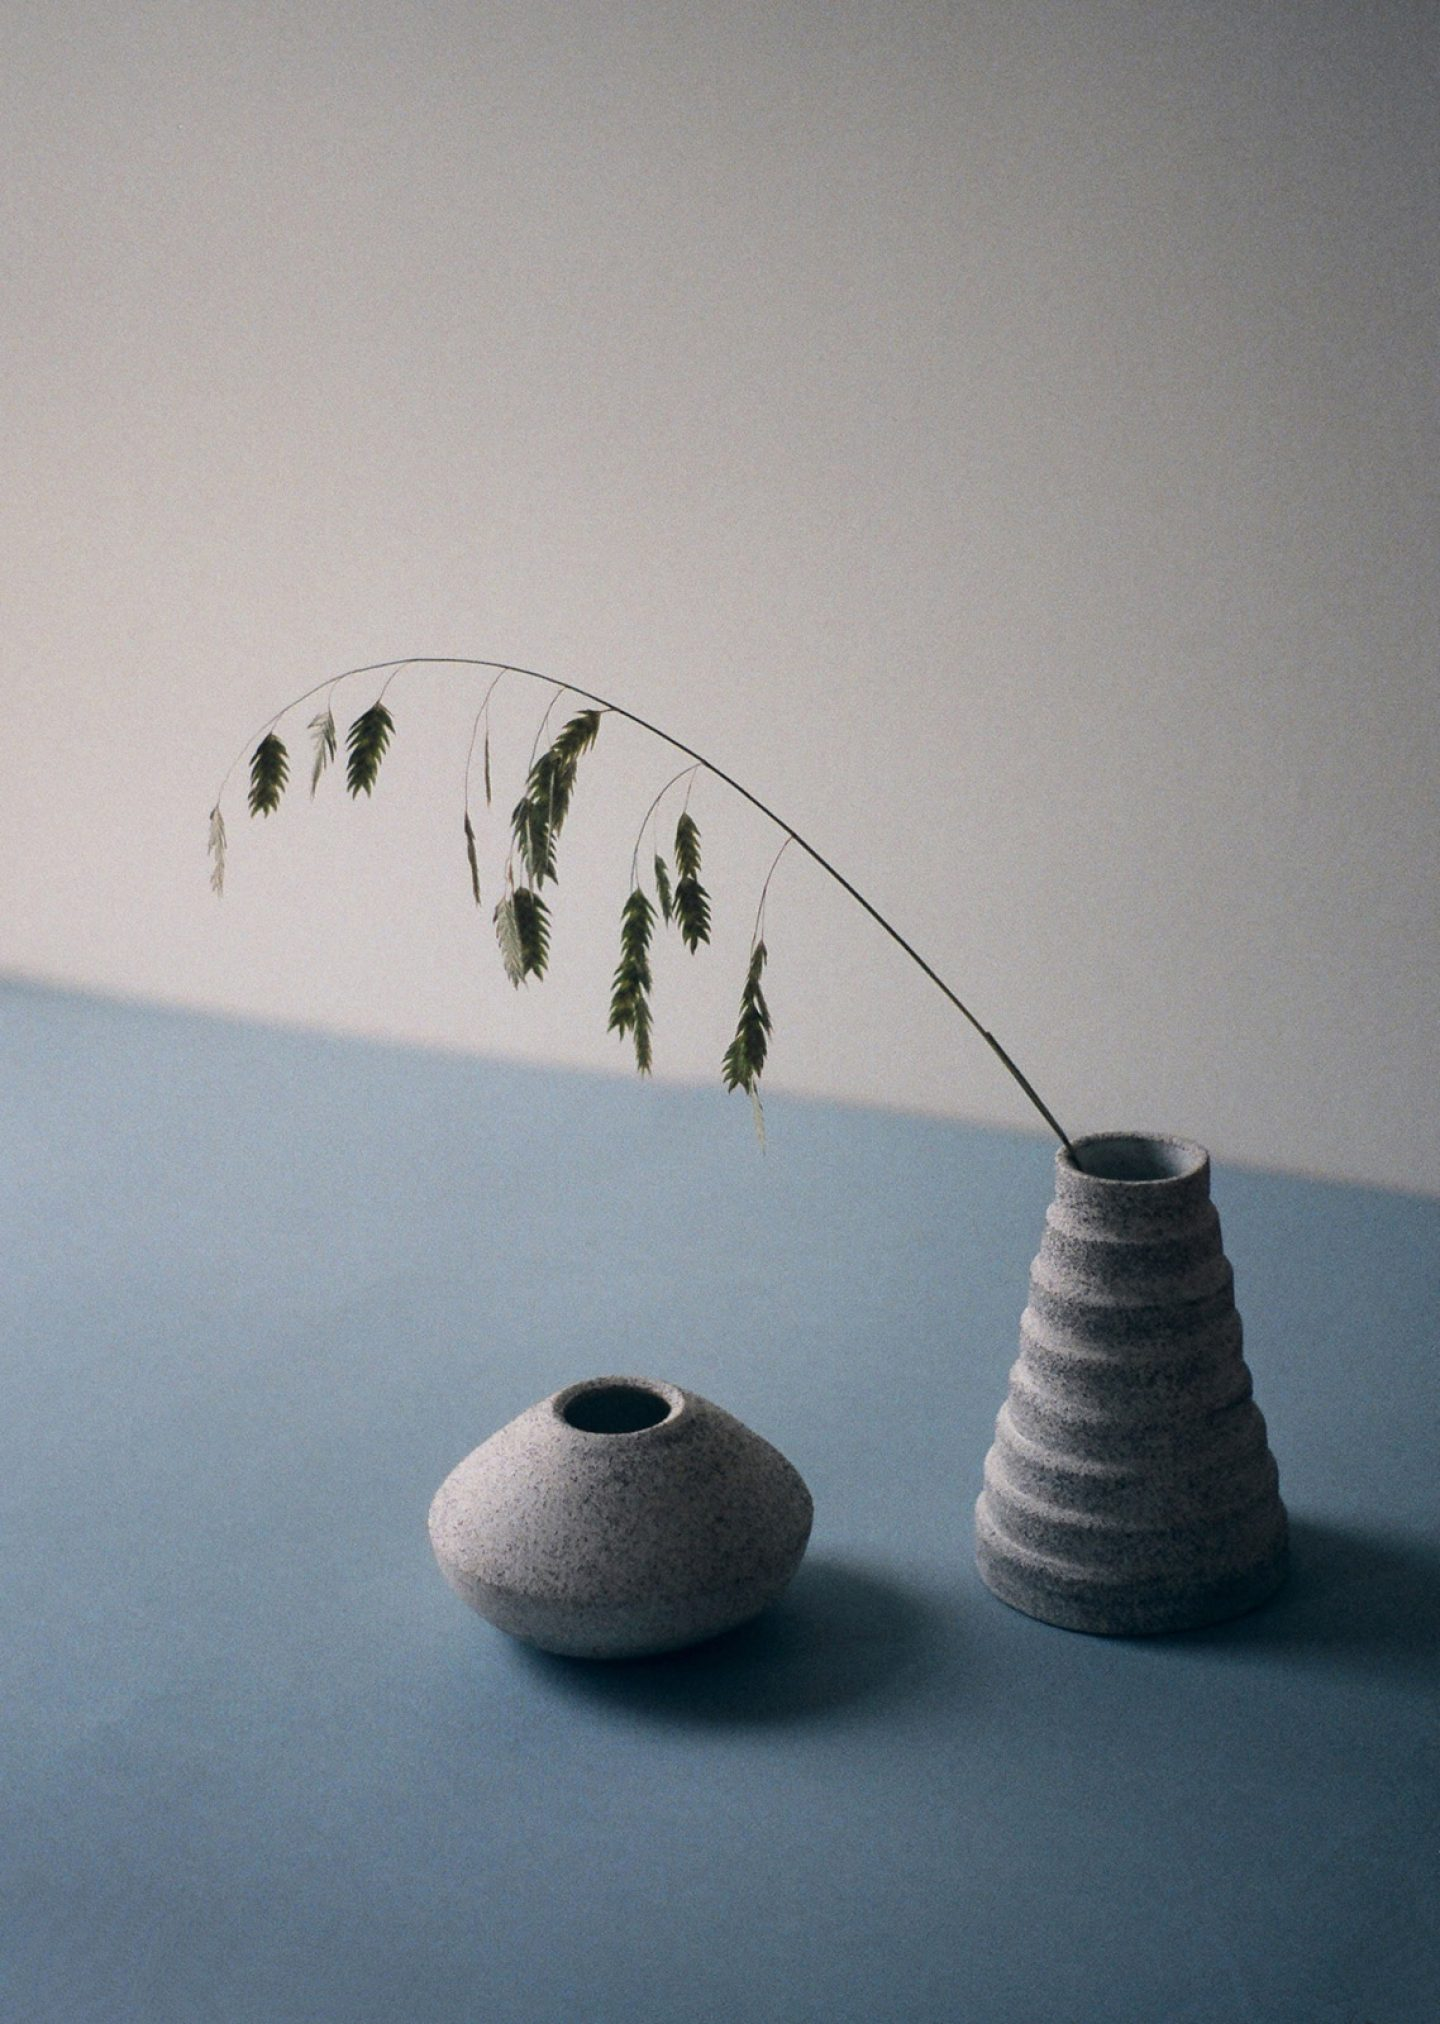 Design-Natalie-Weinberger-Ceramics-3